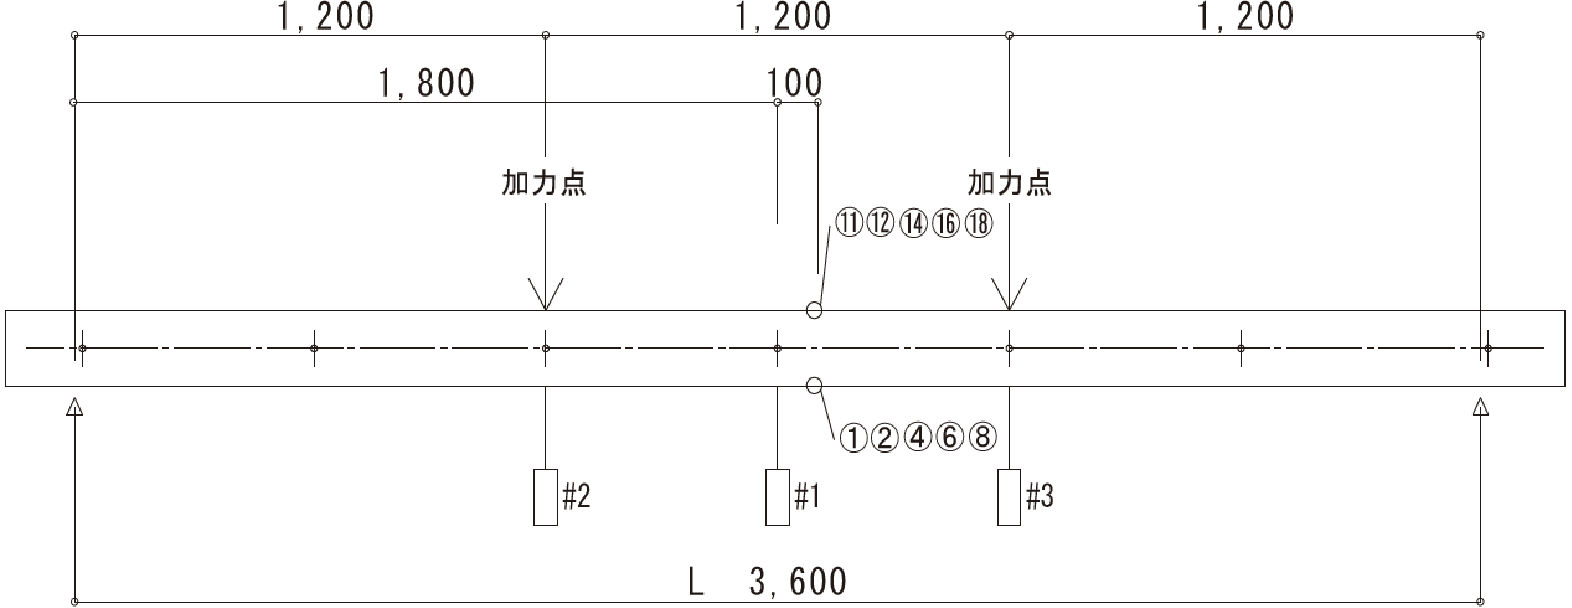 加力位置と変位計位置(1)